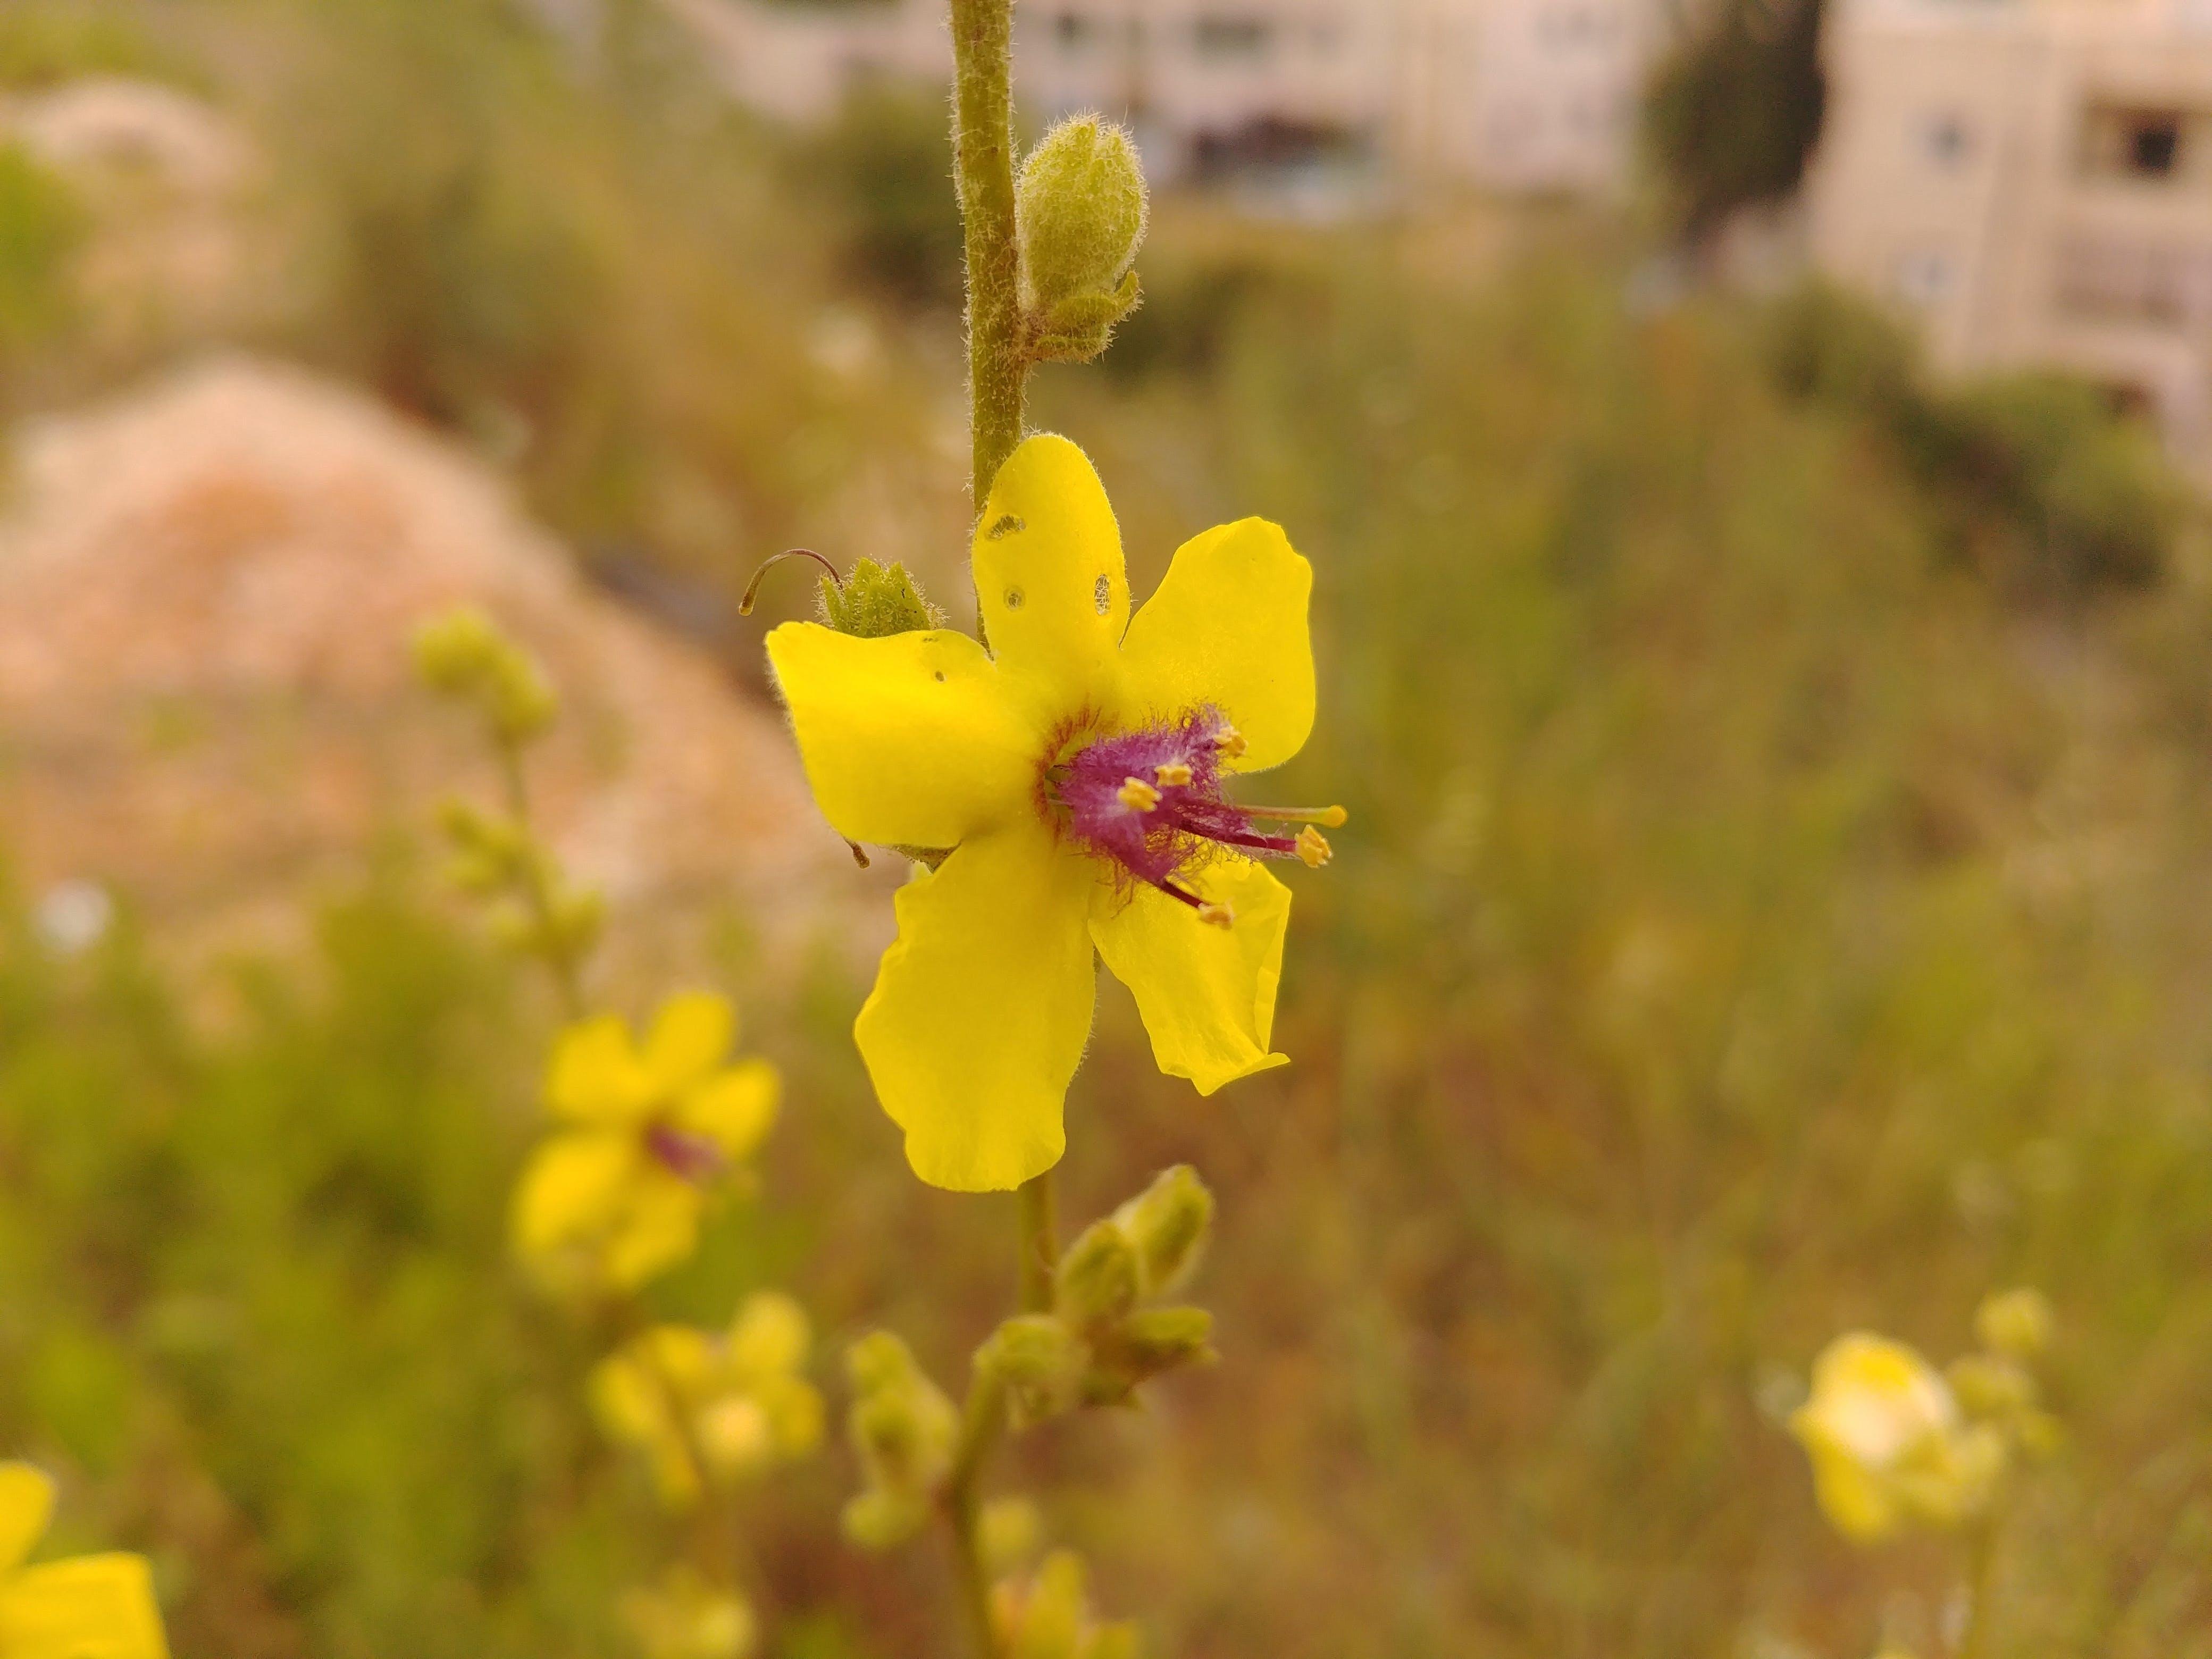 Free stock photo of flower, green, lg, mobilechallenge